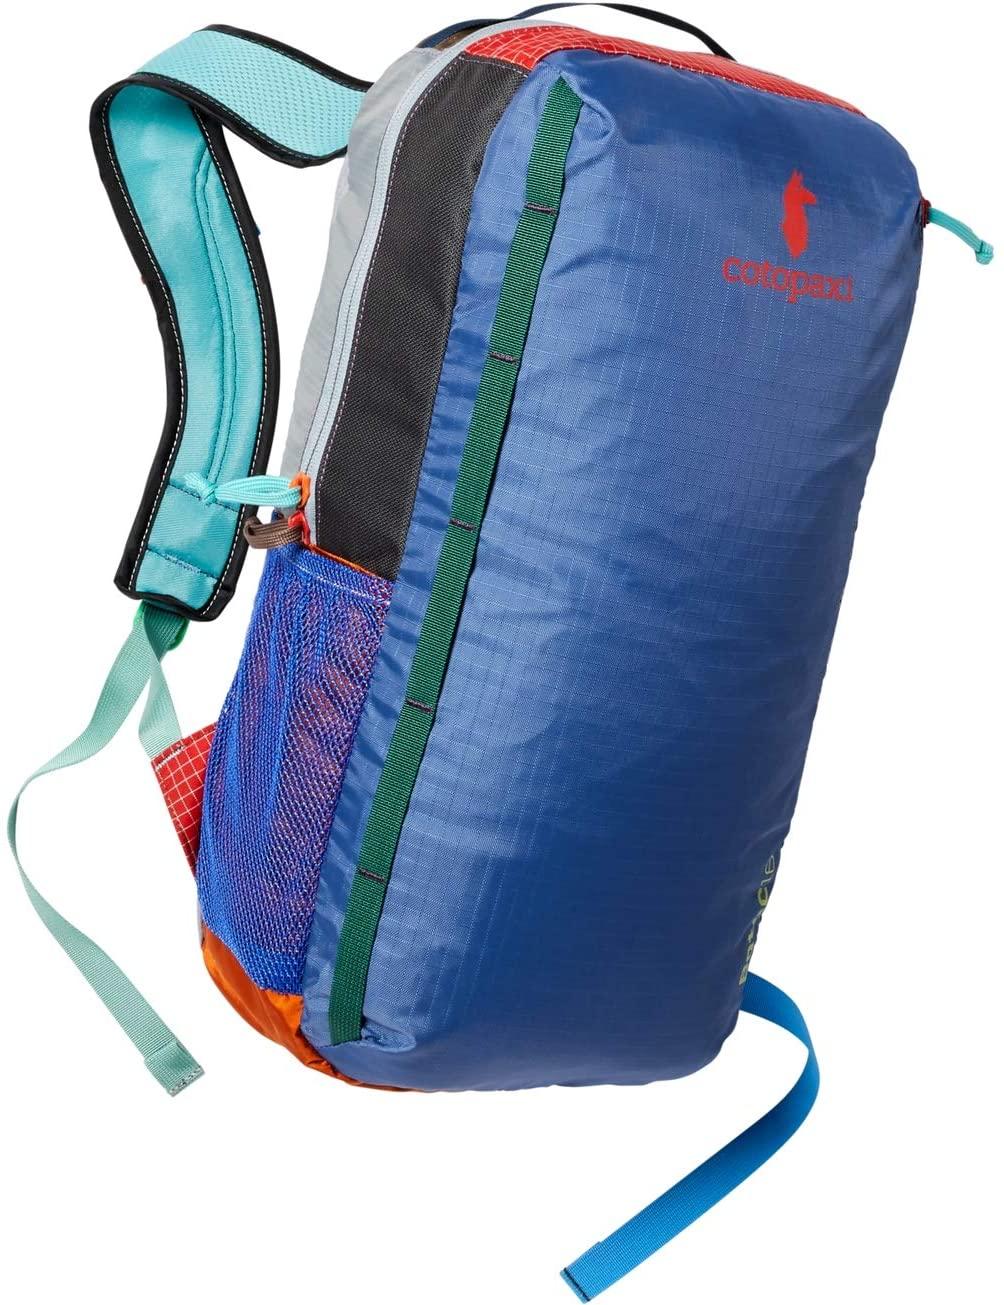 Cotopaxi Batac 24L Pack